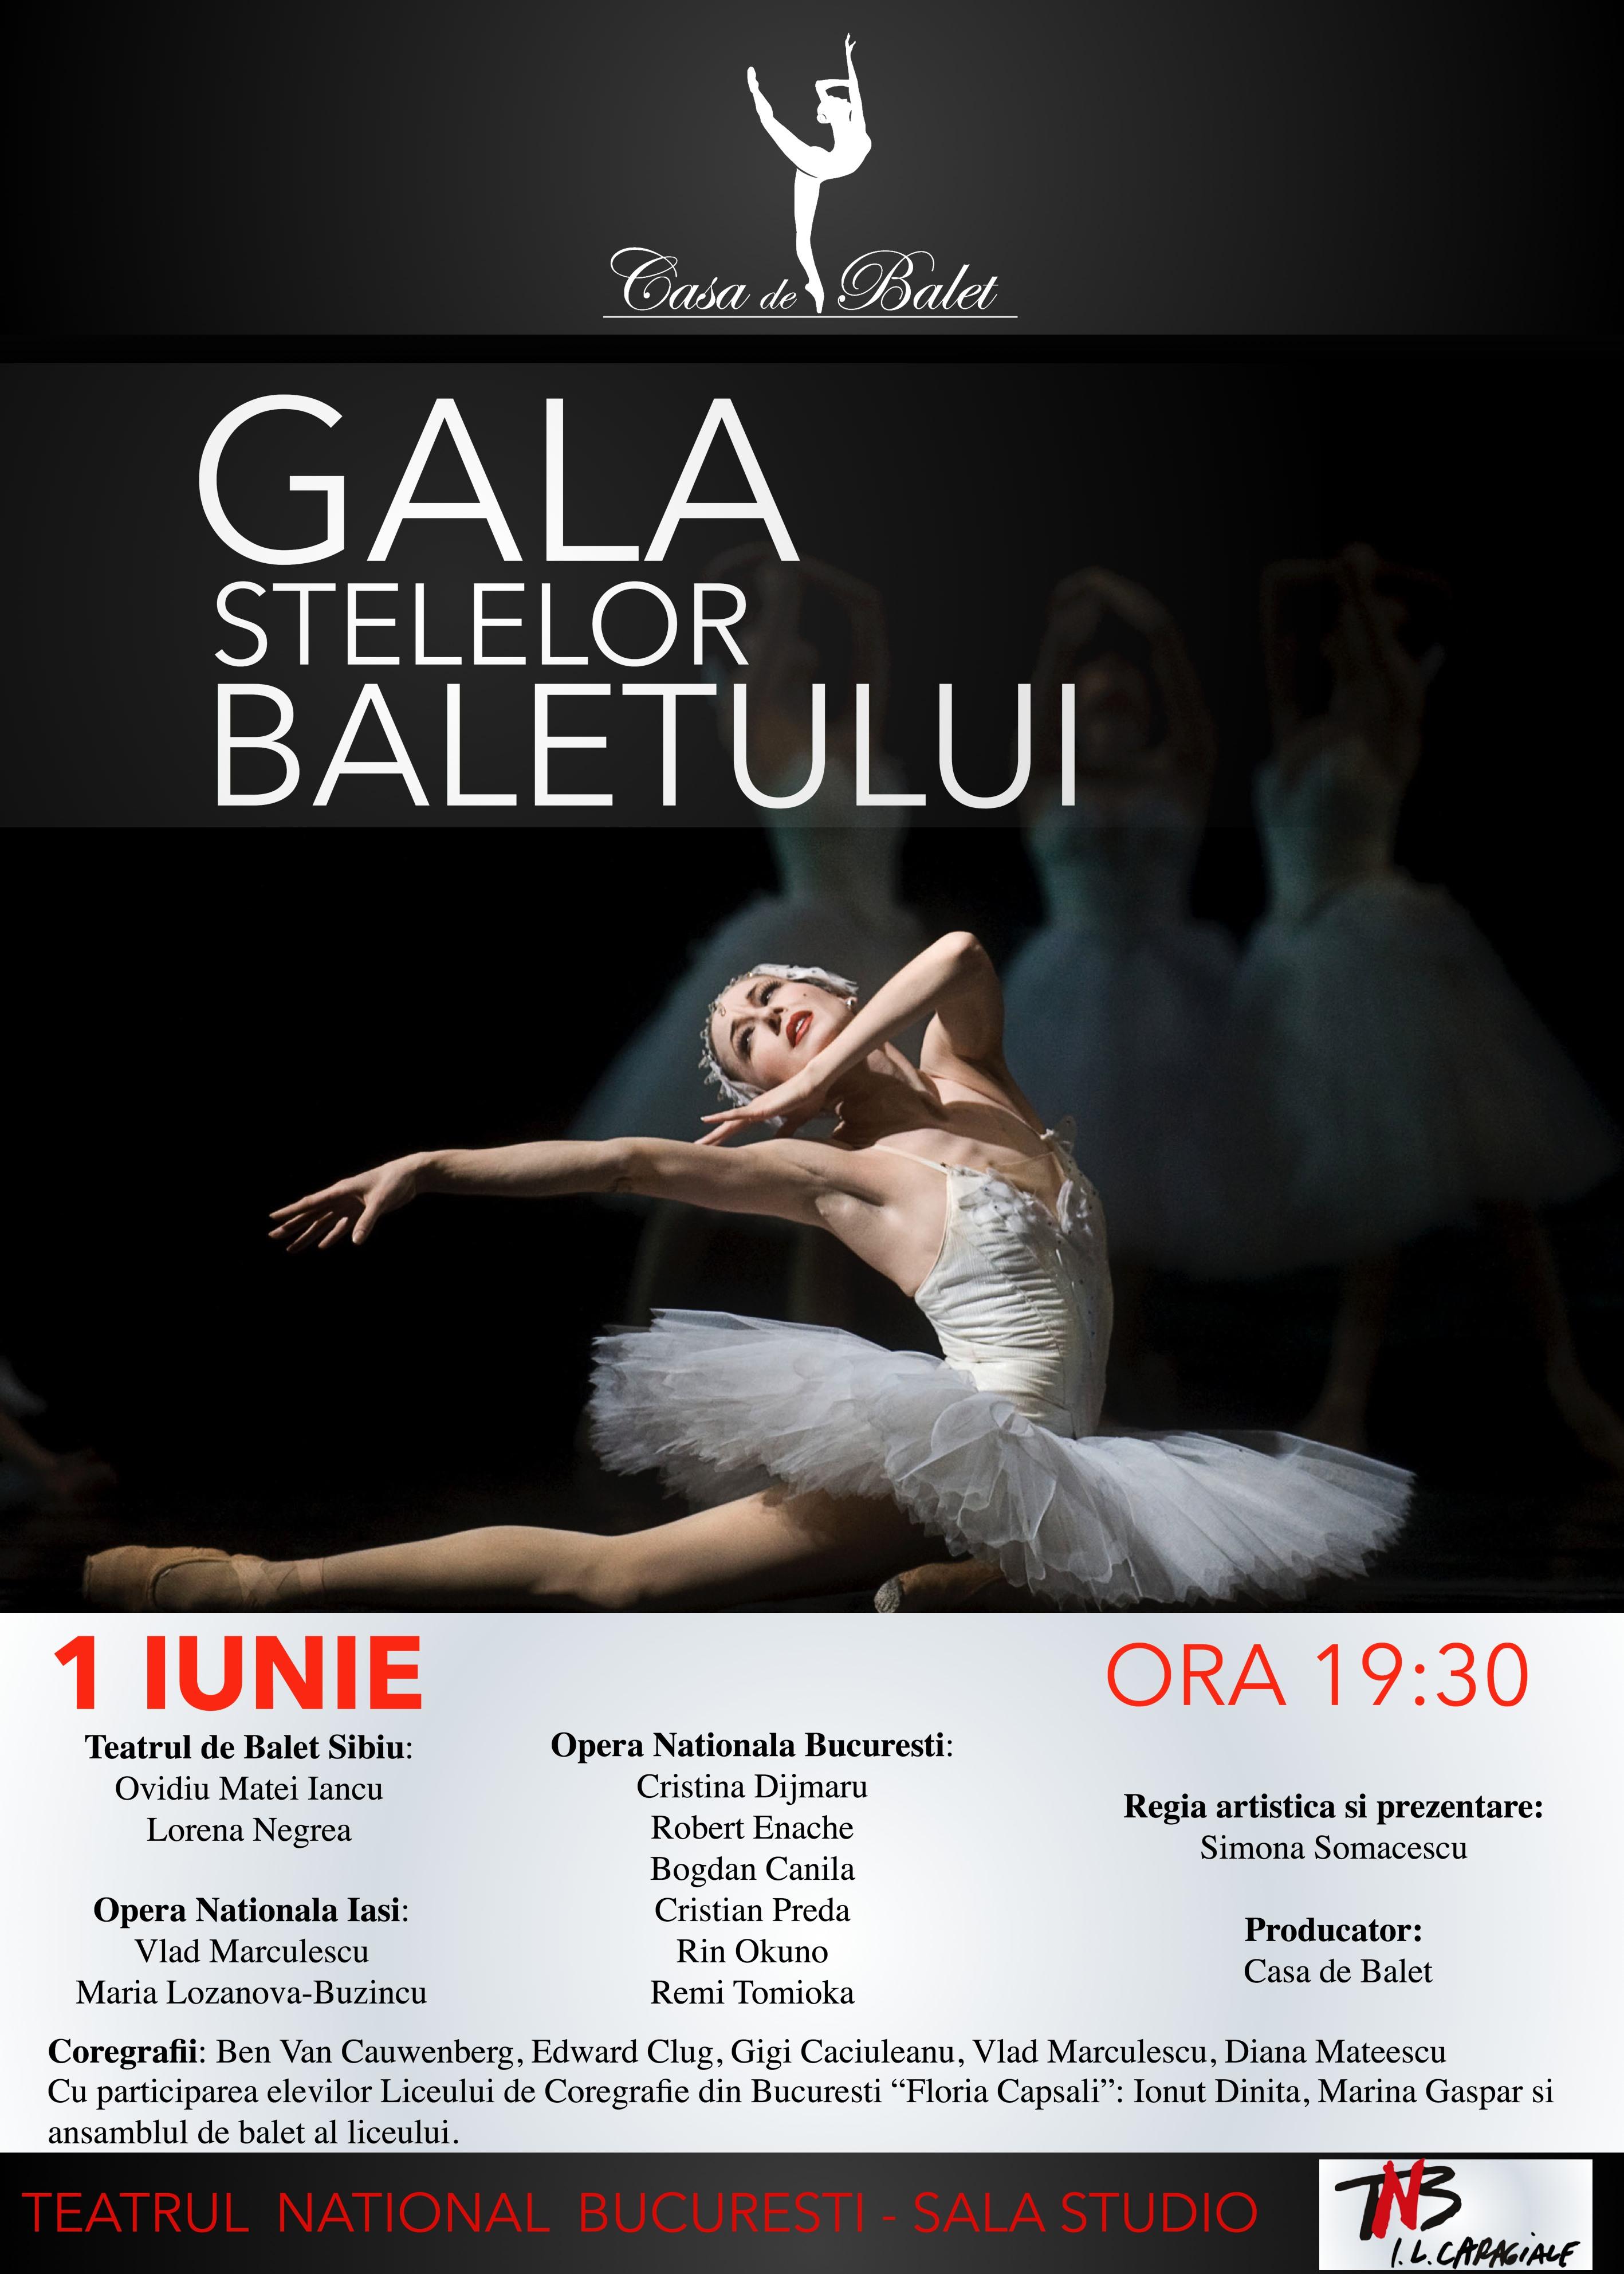 Gala Stelelor Baletului